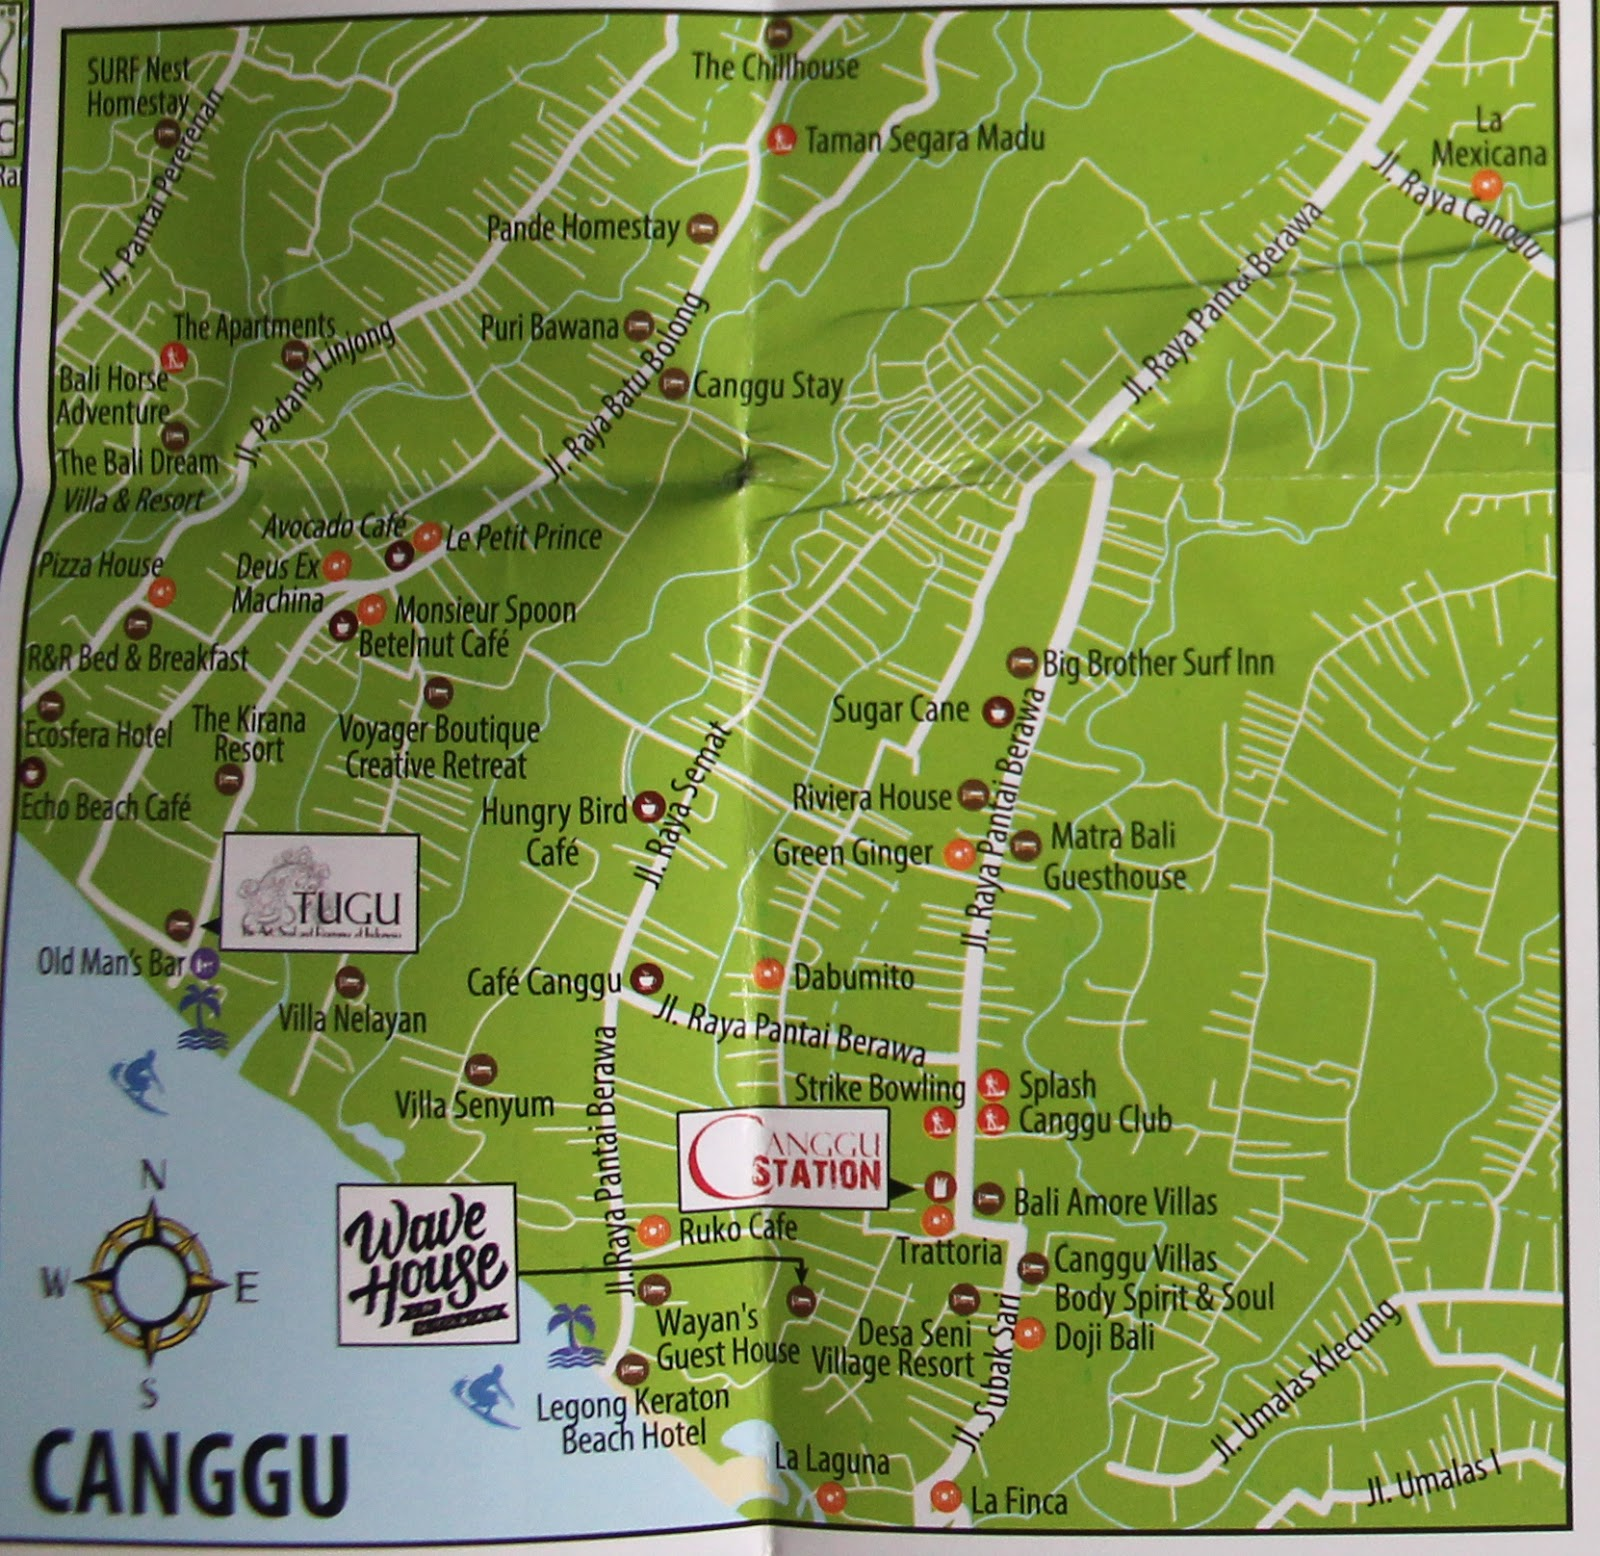 Bali Ultimate Guide to Bali Map essentials 3Femme